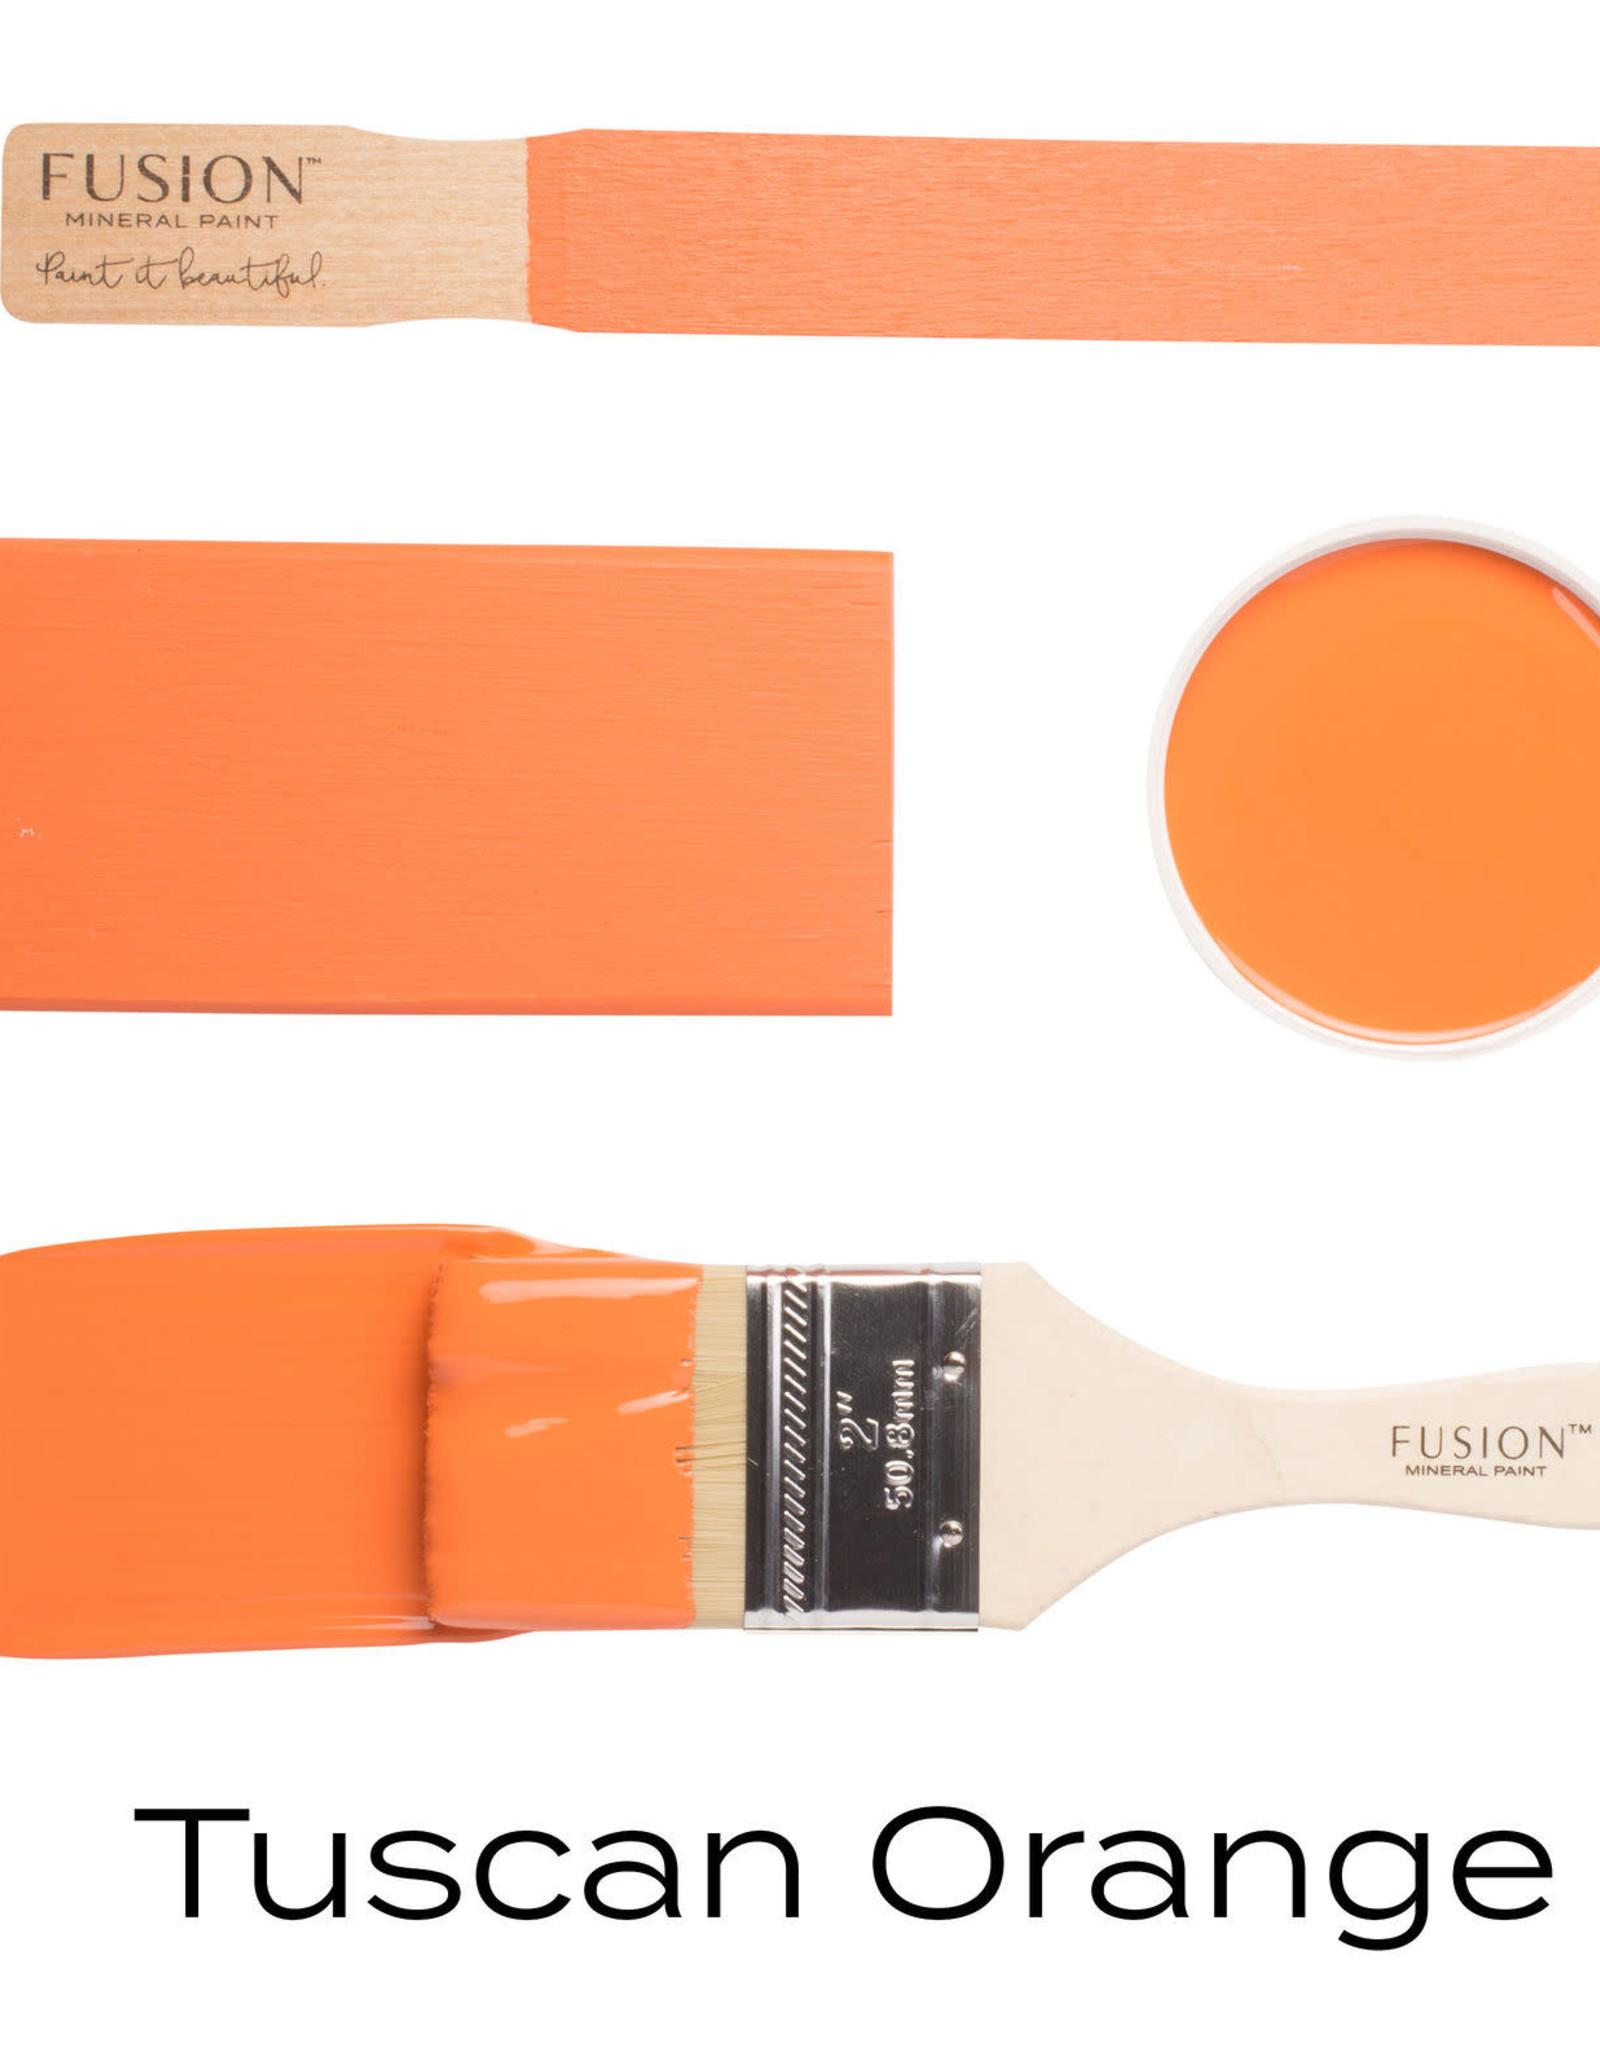 Fusion Mineral Paint Fusion Mineral Paint - Tuscan Orange 37ml